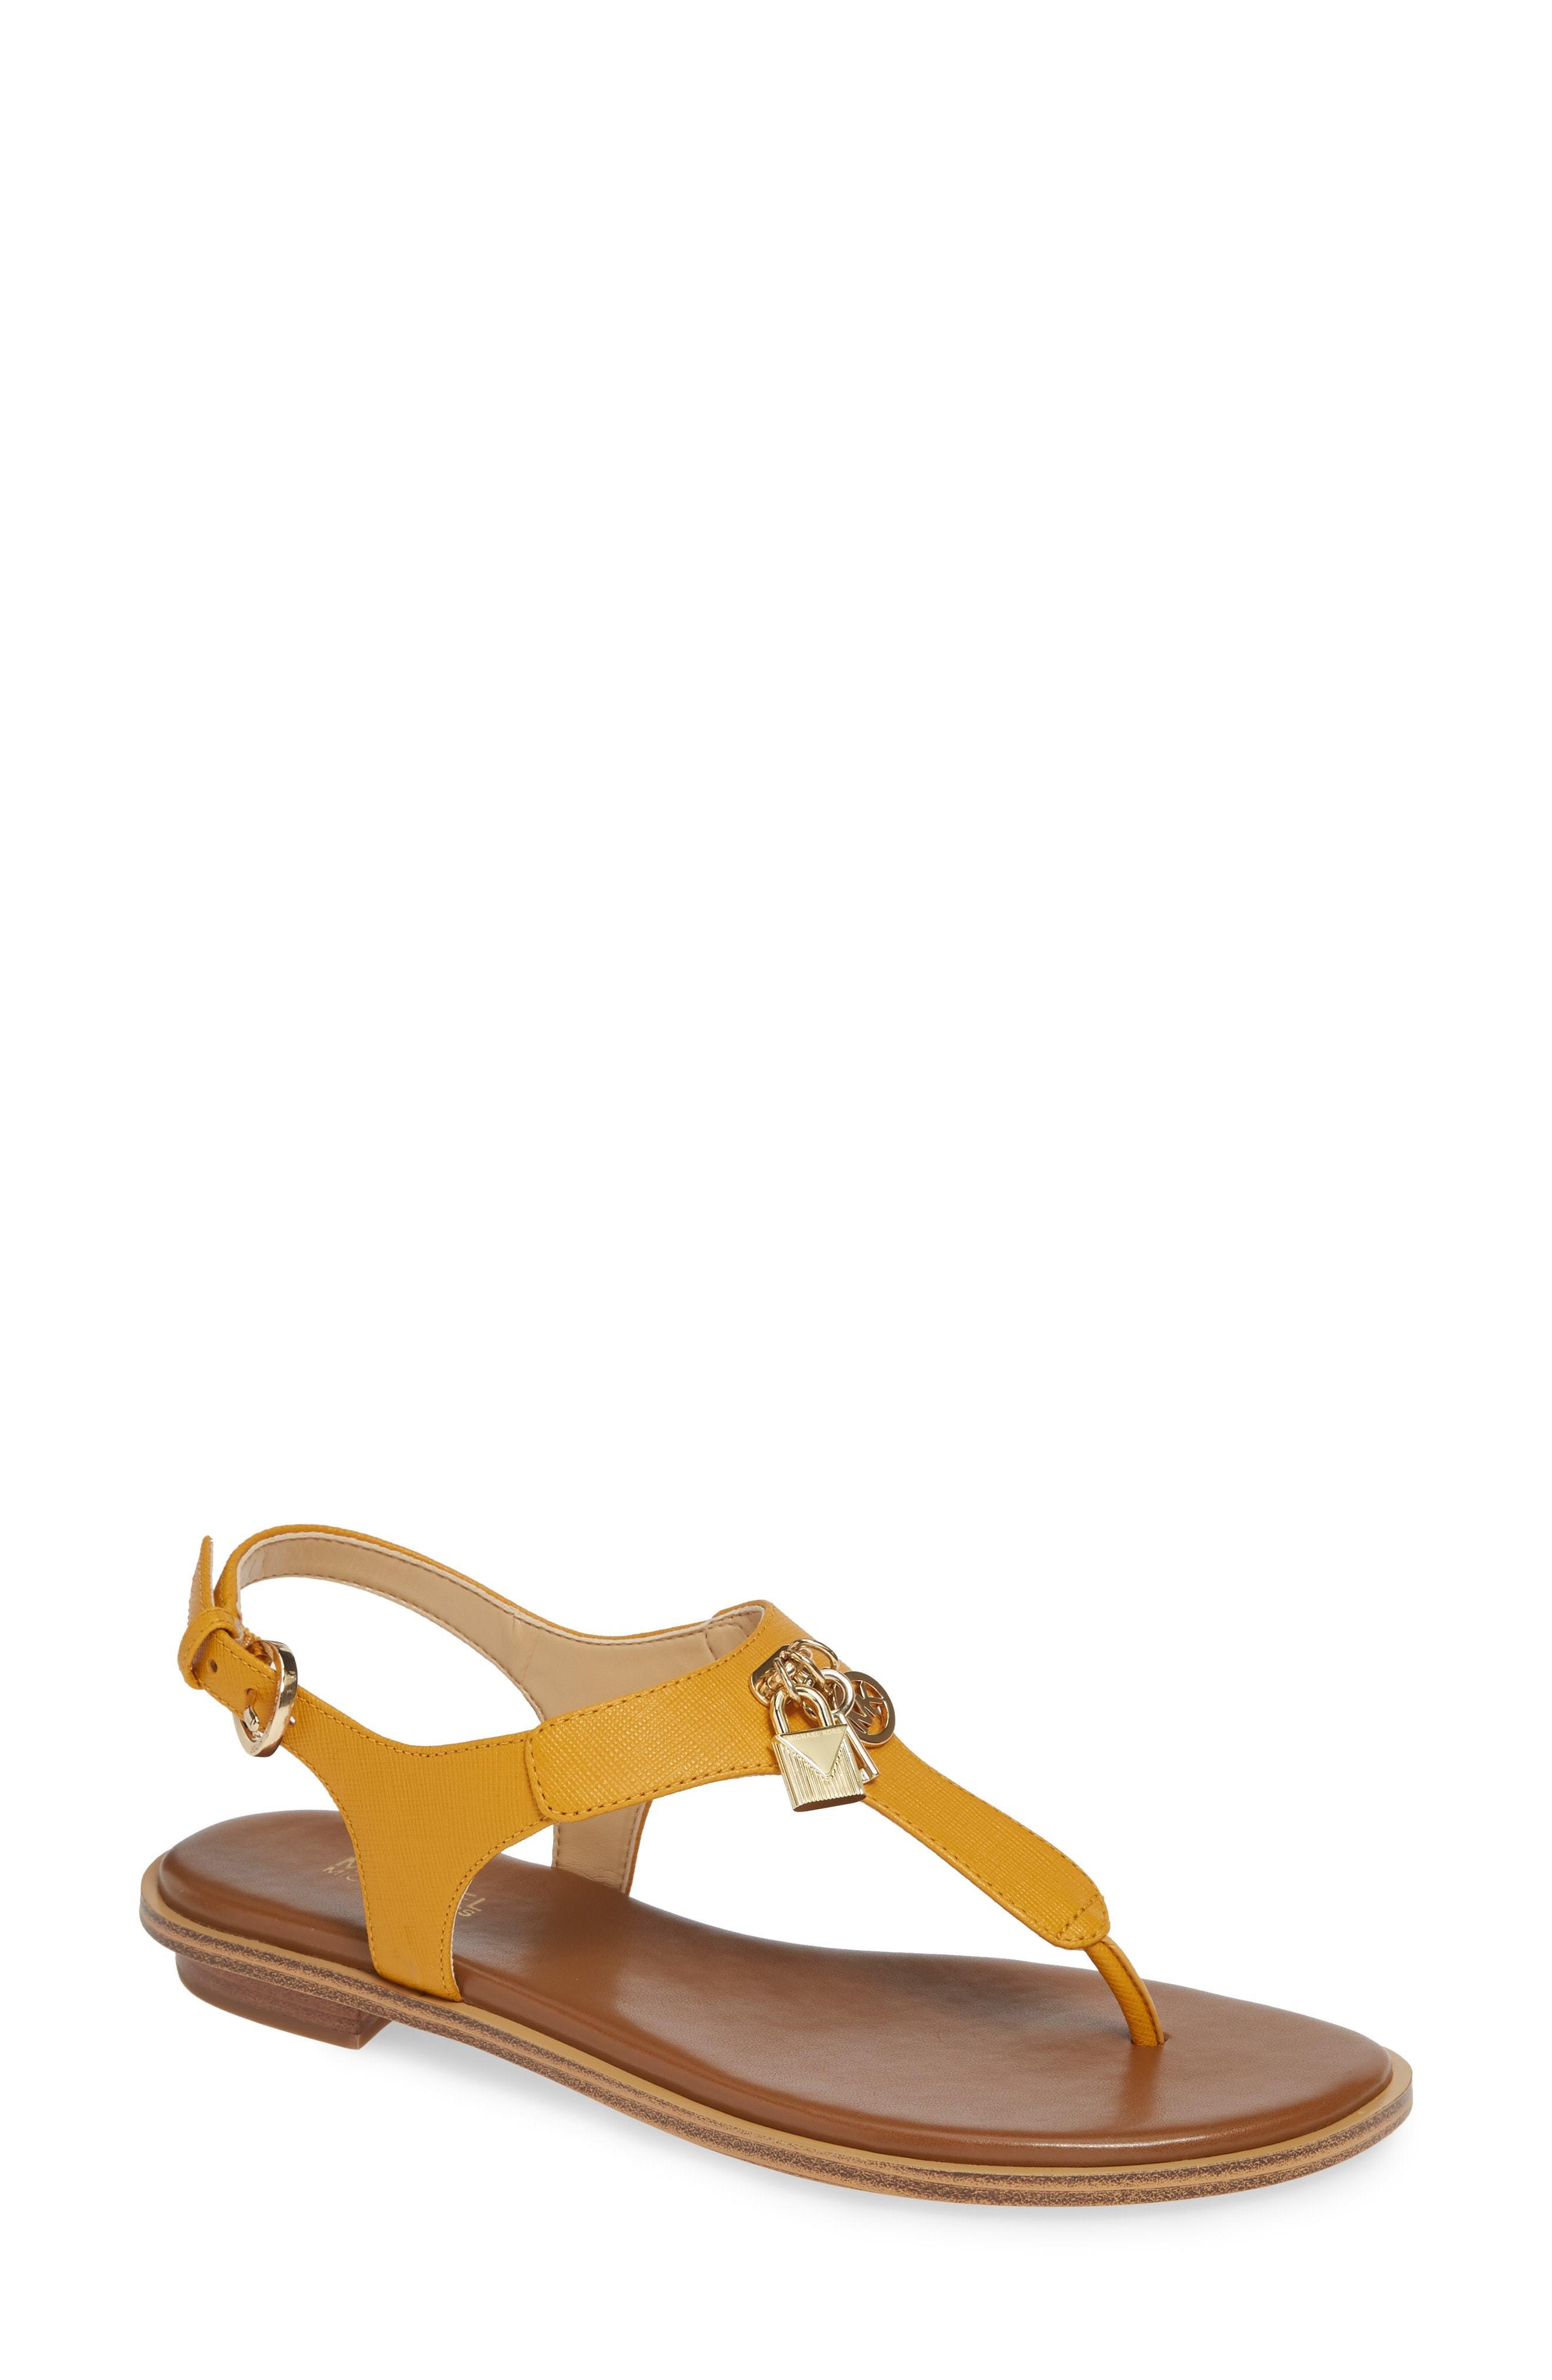 ee8ef709d0f MICHAEL Michael Kors Suki T Strap Charm Sandal, $59 | Nordstrom ...